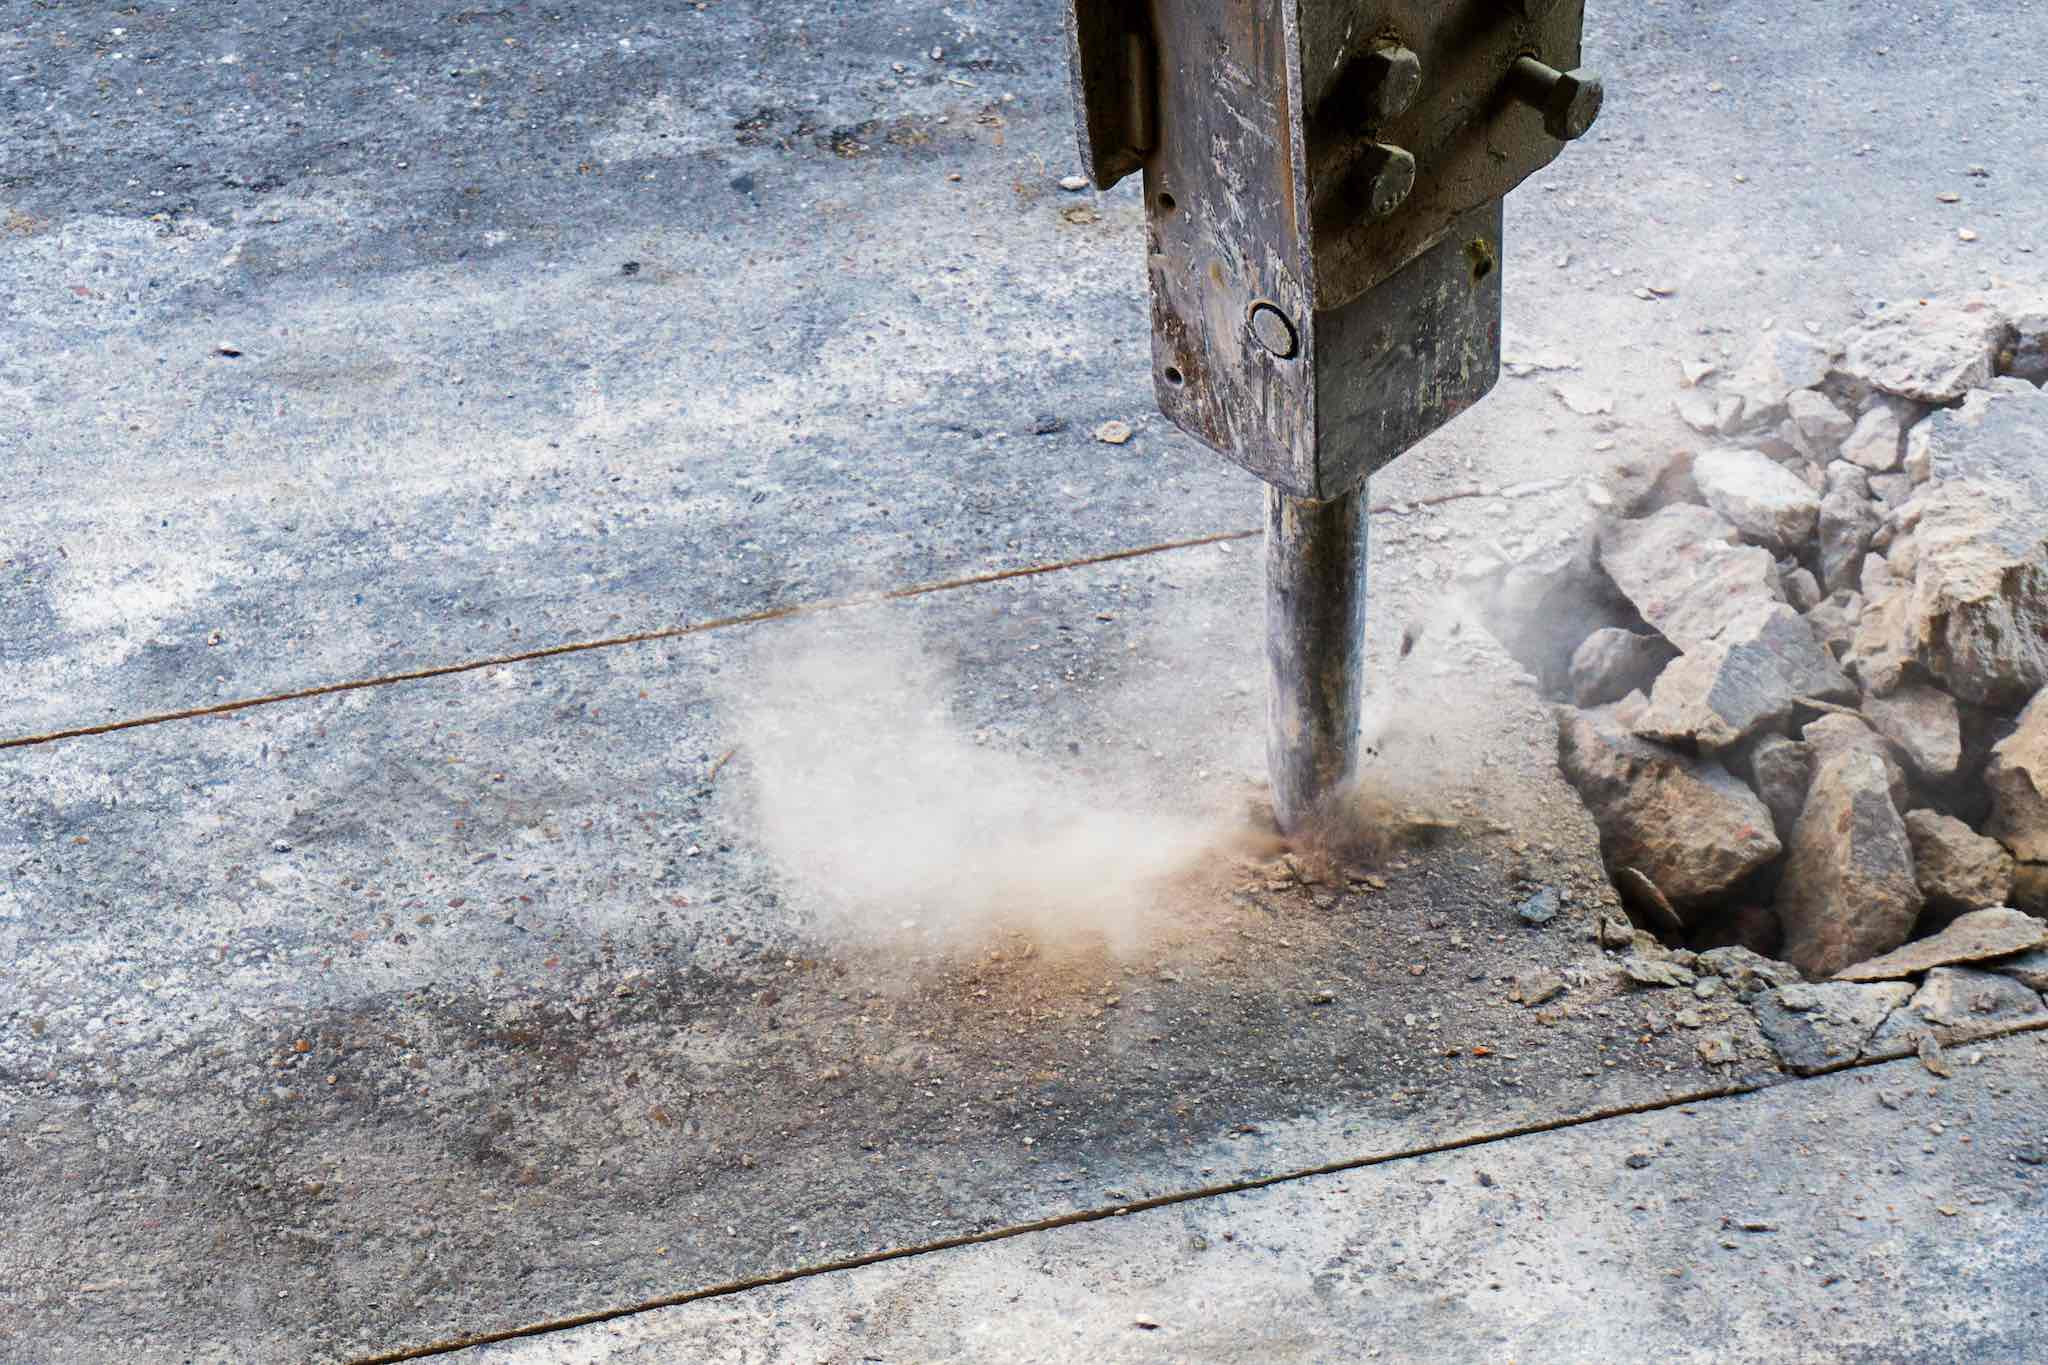 Affordable Concrete Cutting - Jack Hammer